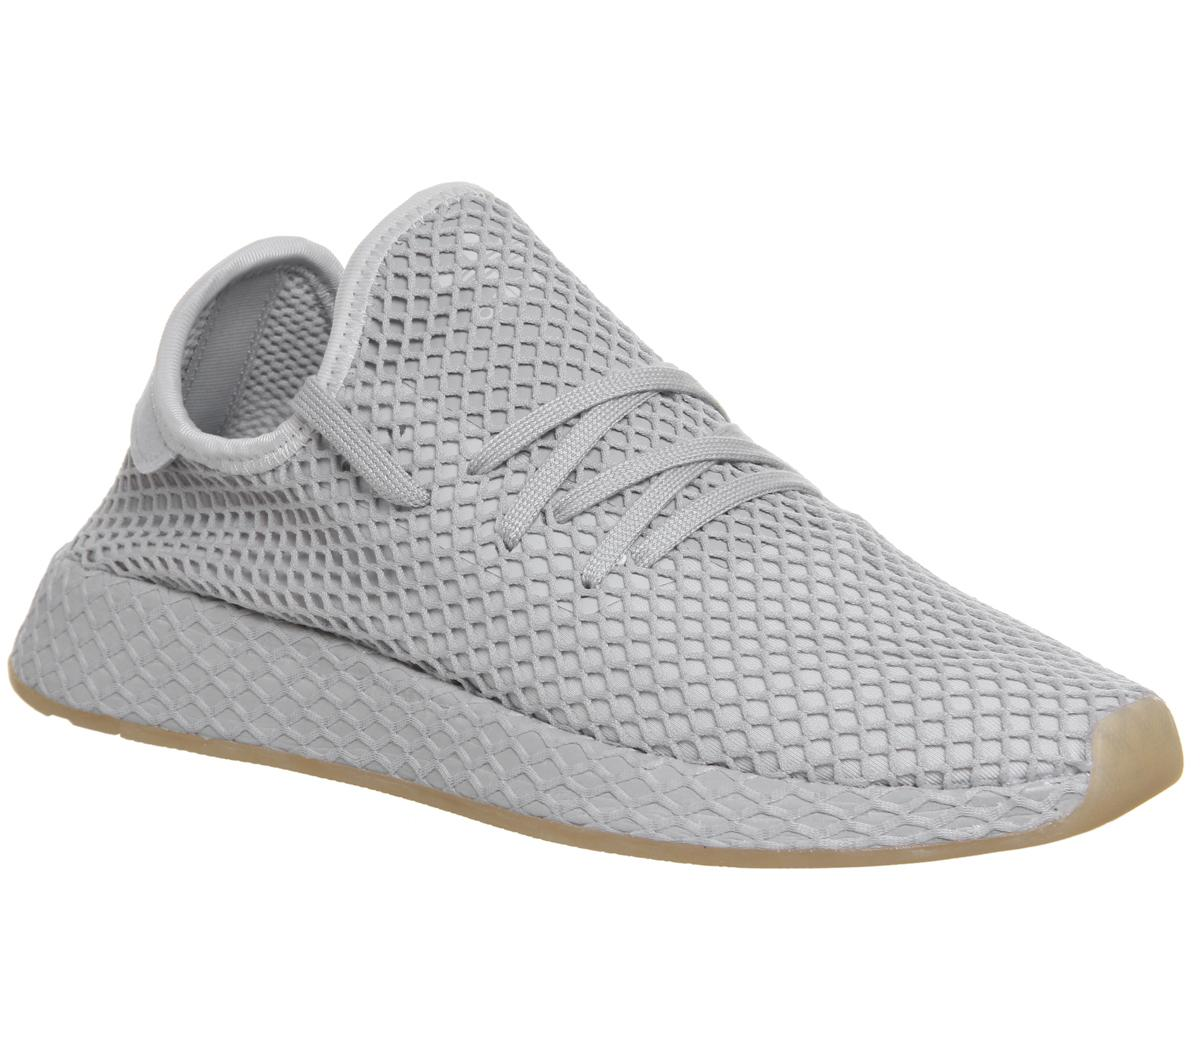 adidas Deerupt Trainers Grey Grey Gum